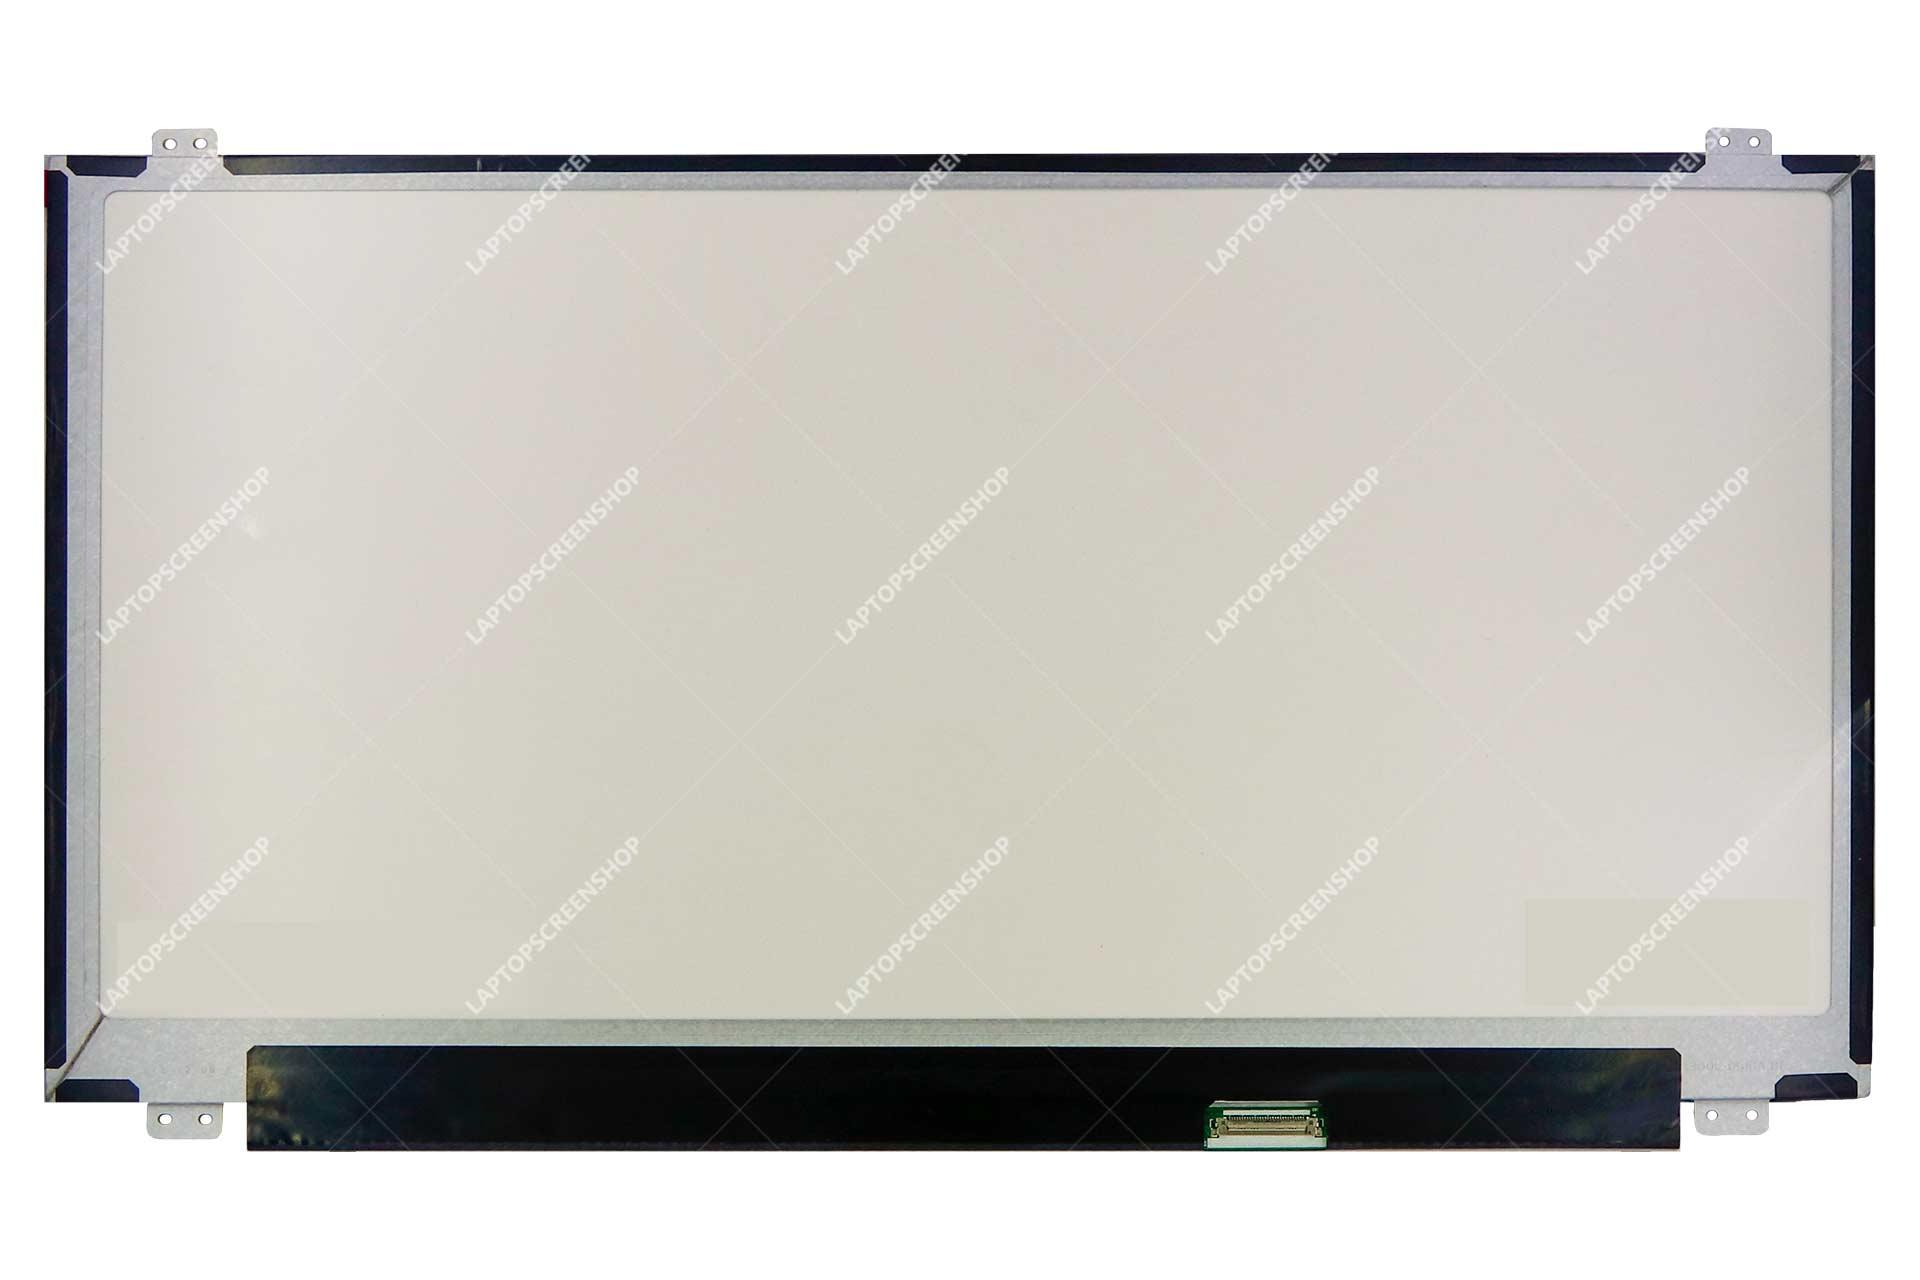 ACER-ASPIRE-E1-472-6414-LCD  HD فروشگاه لپ تاپ اسکرين   تعمير لپ تاپ